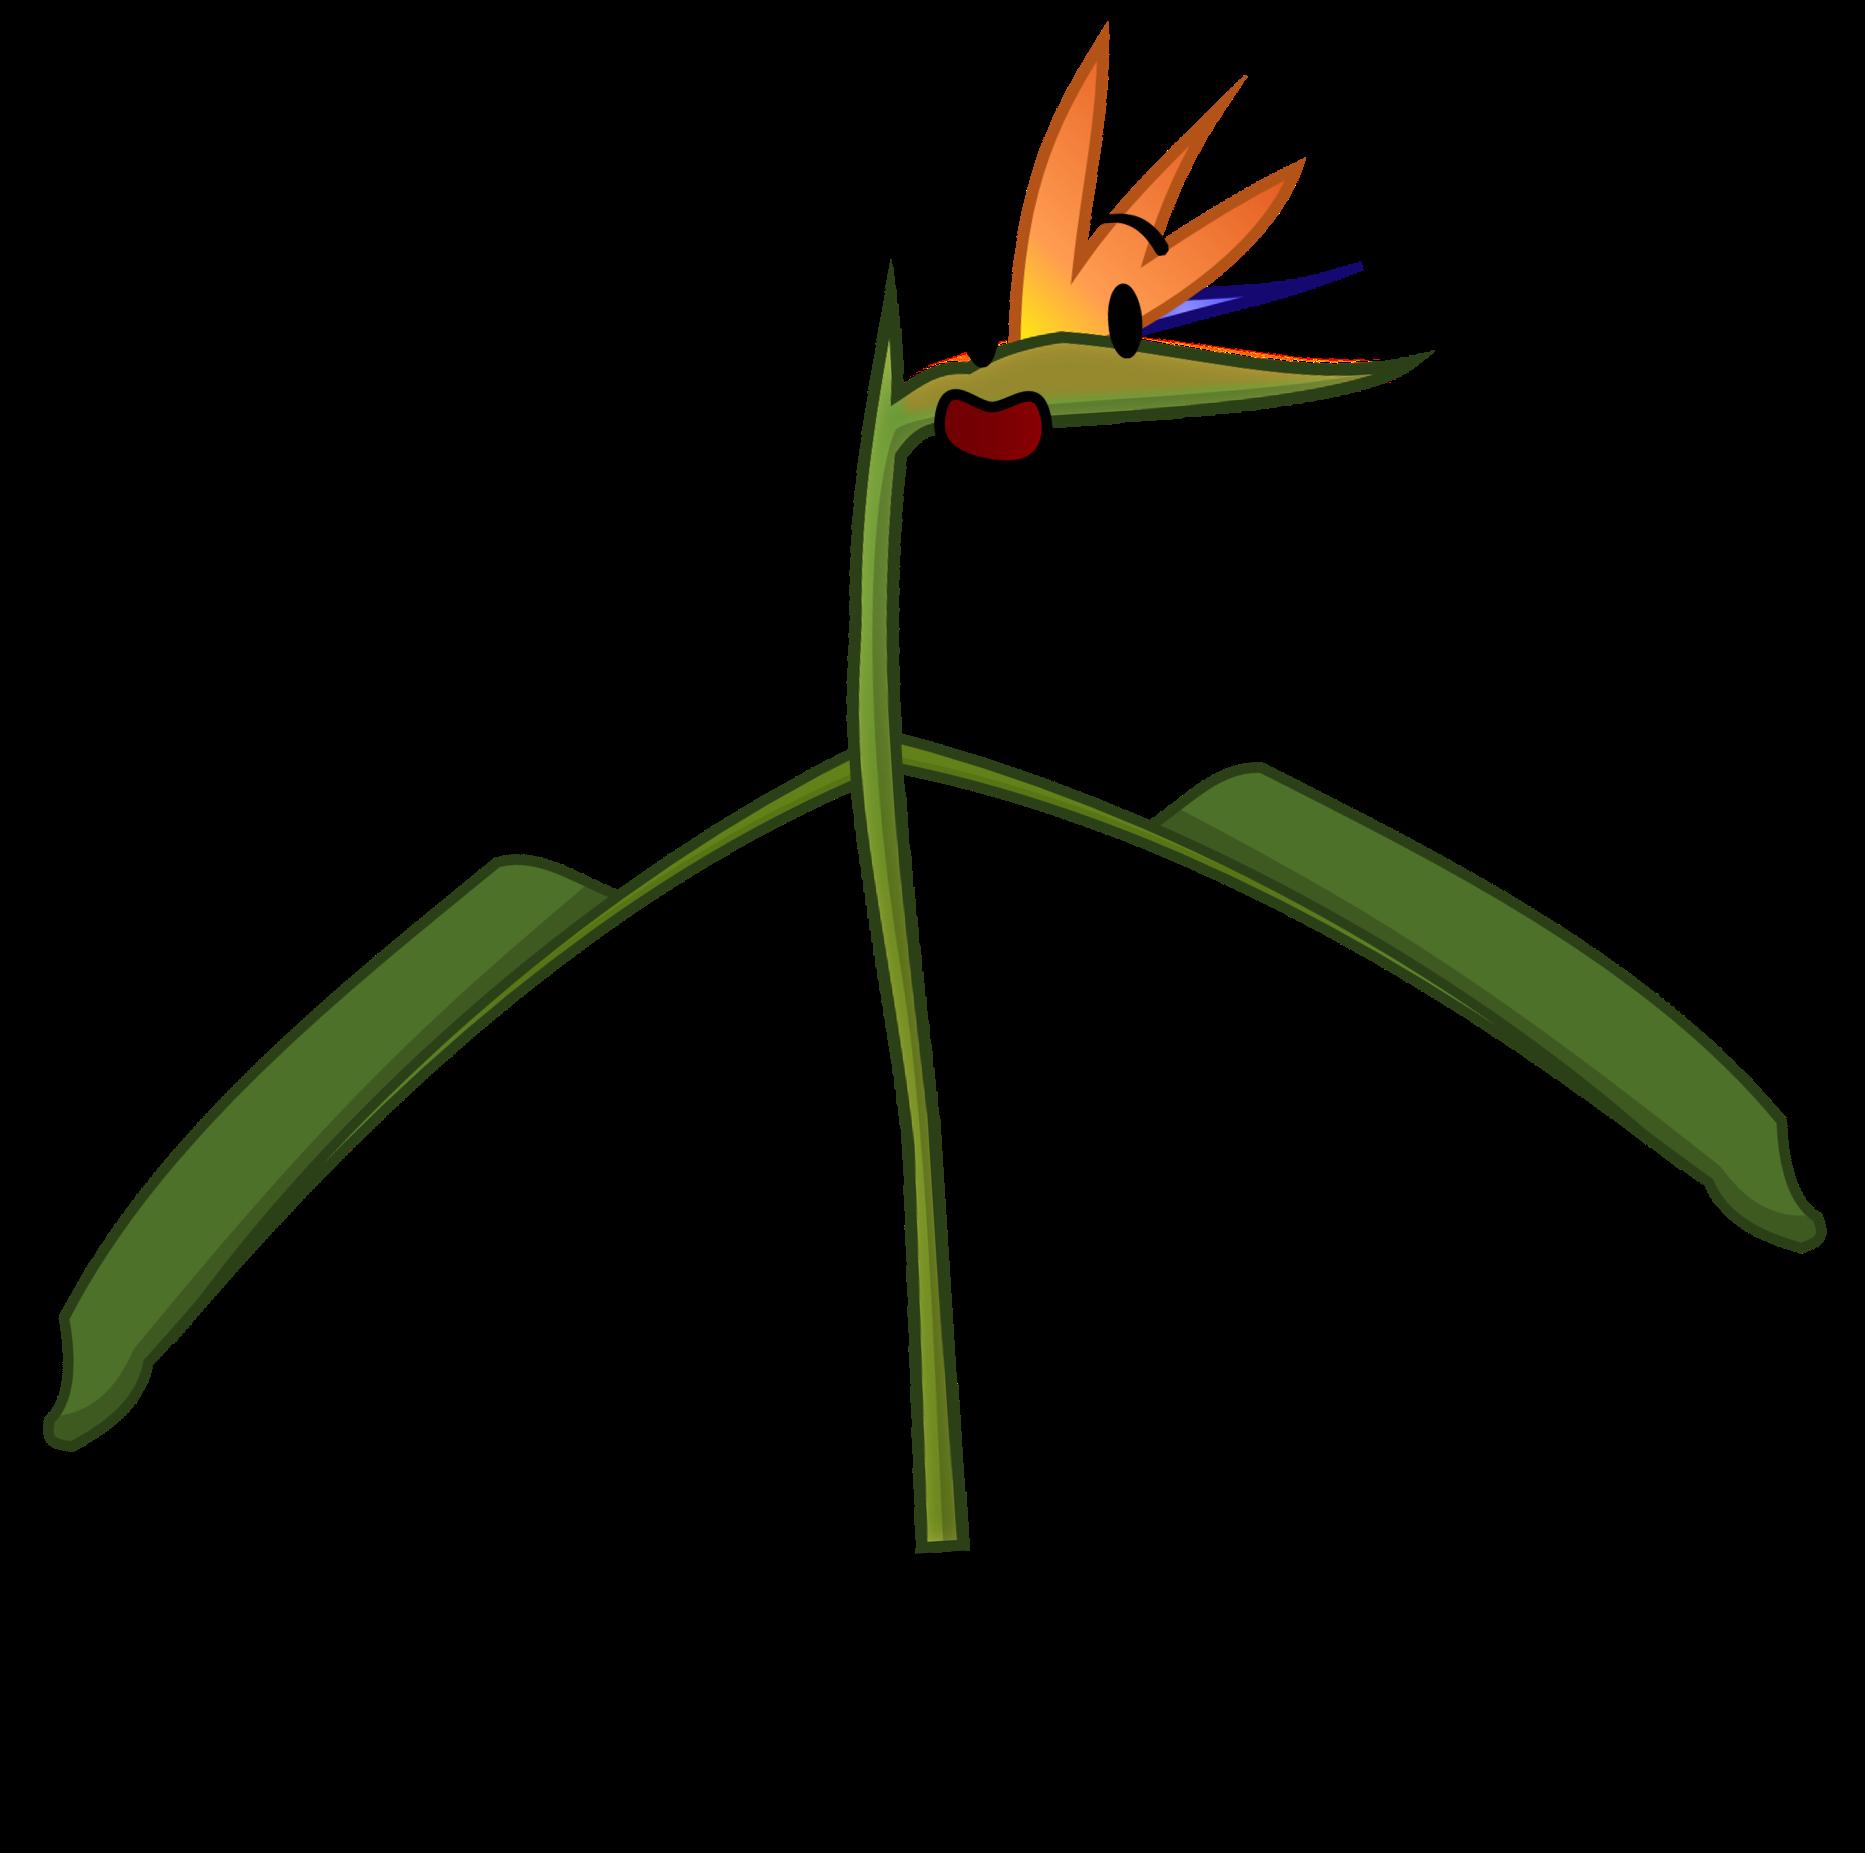 Flower object connects wiki. Crane clipart crane arm